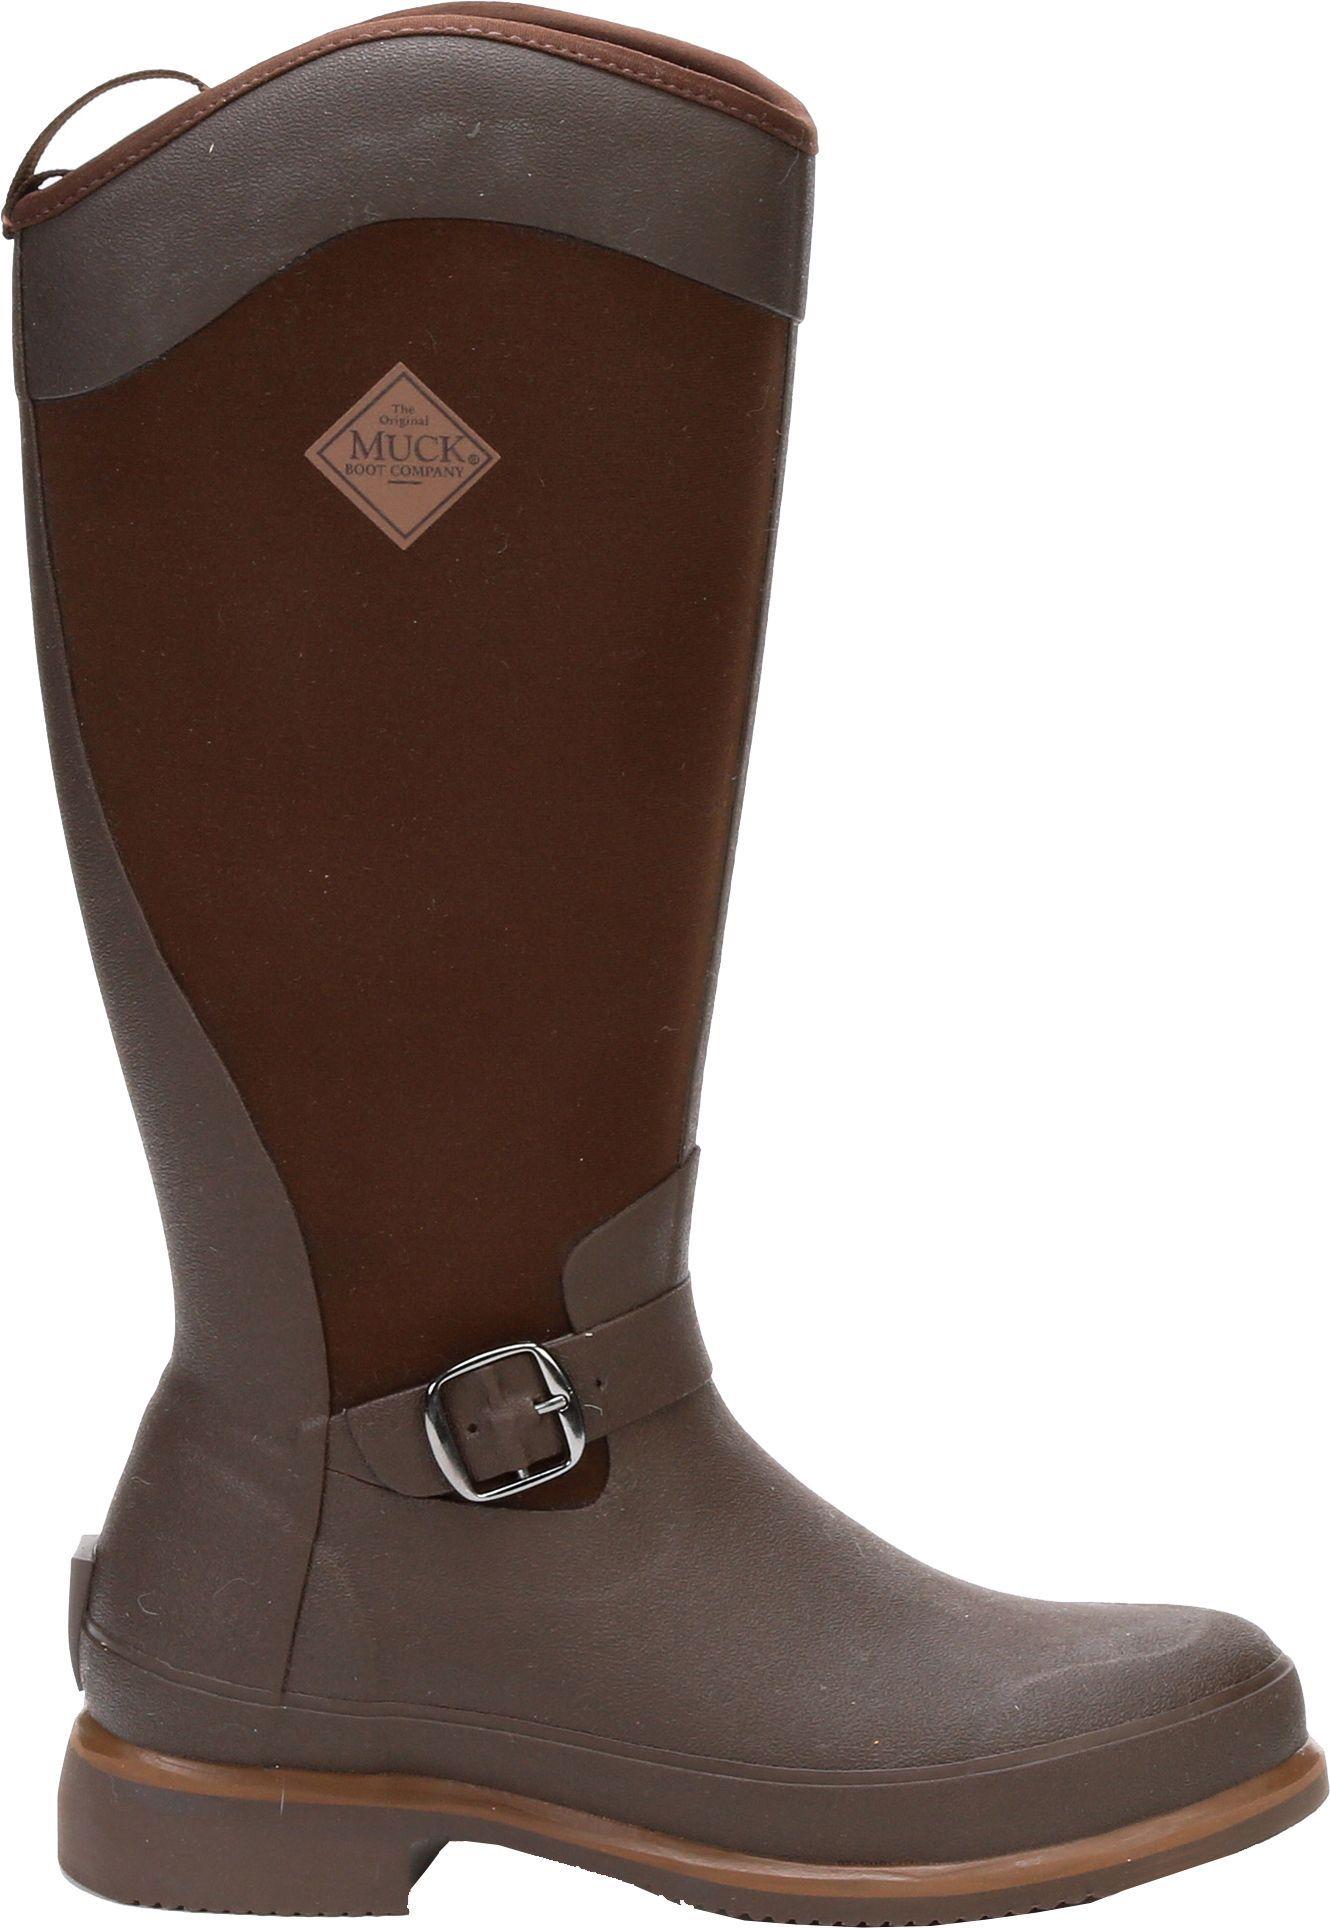 Muck Boot Women s Reign Waterproof Rubber Hunting Boots 7806f1207e